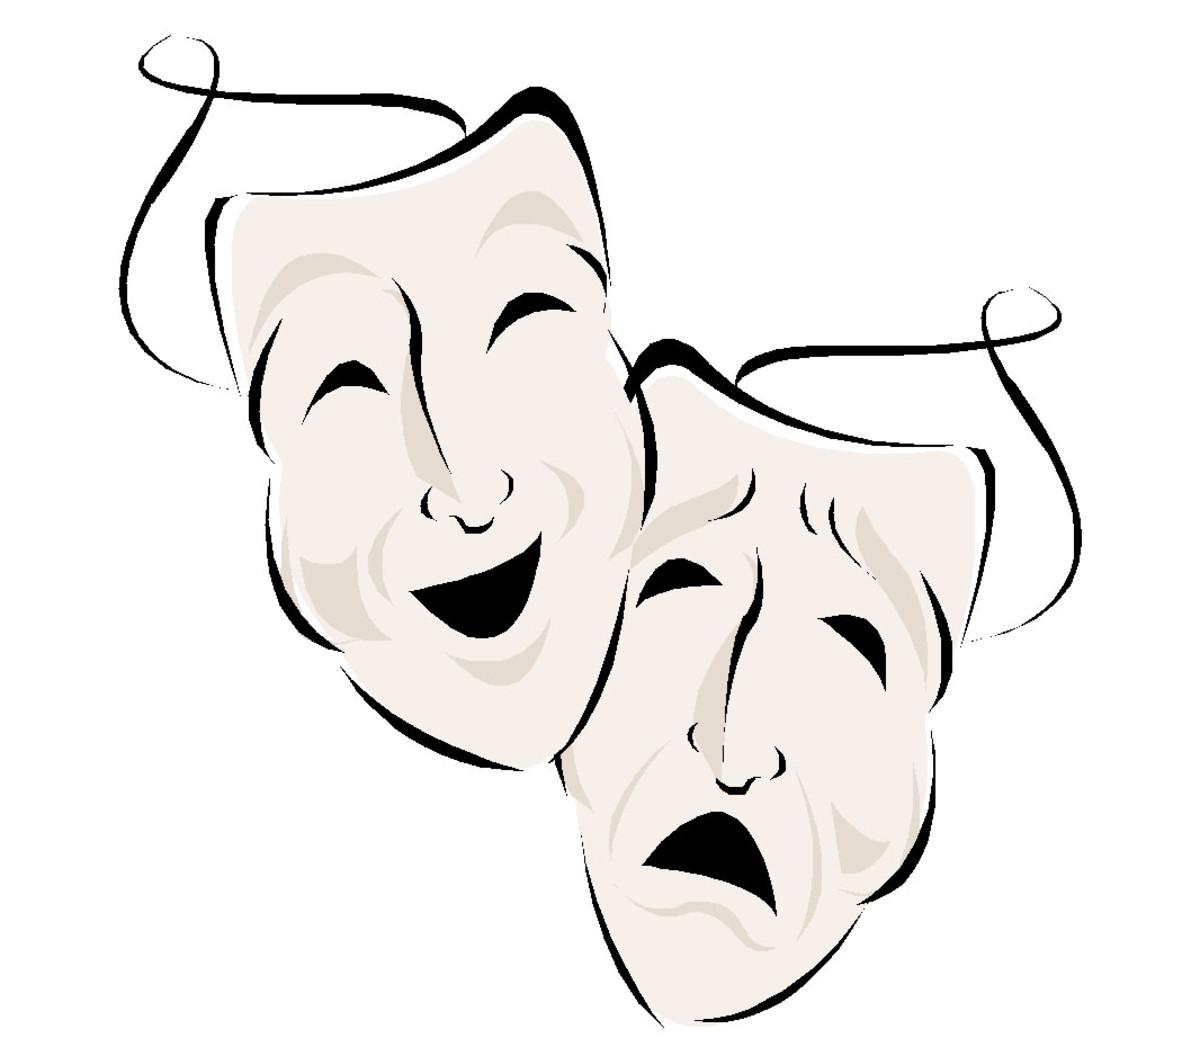 narcissistic-malvolio-in-shakespeares-twelfth-night